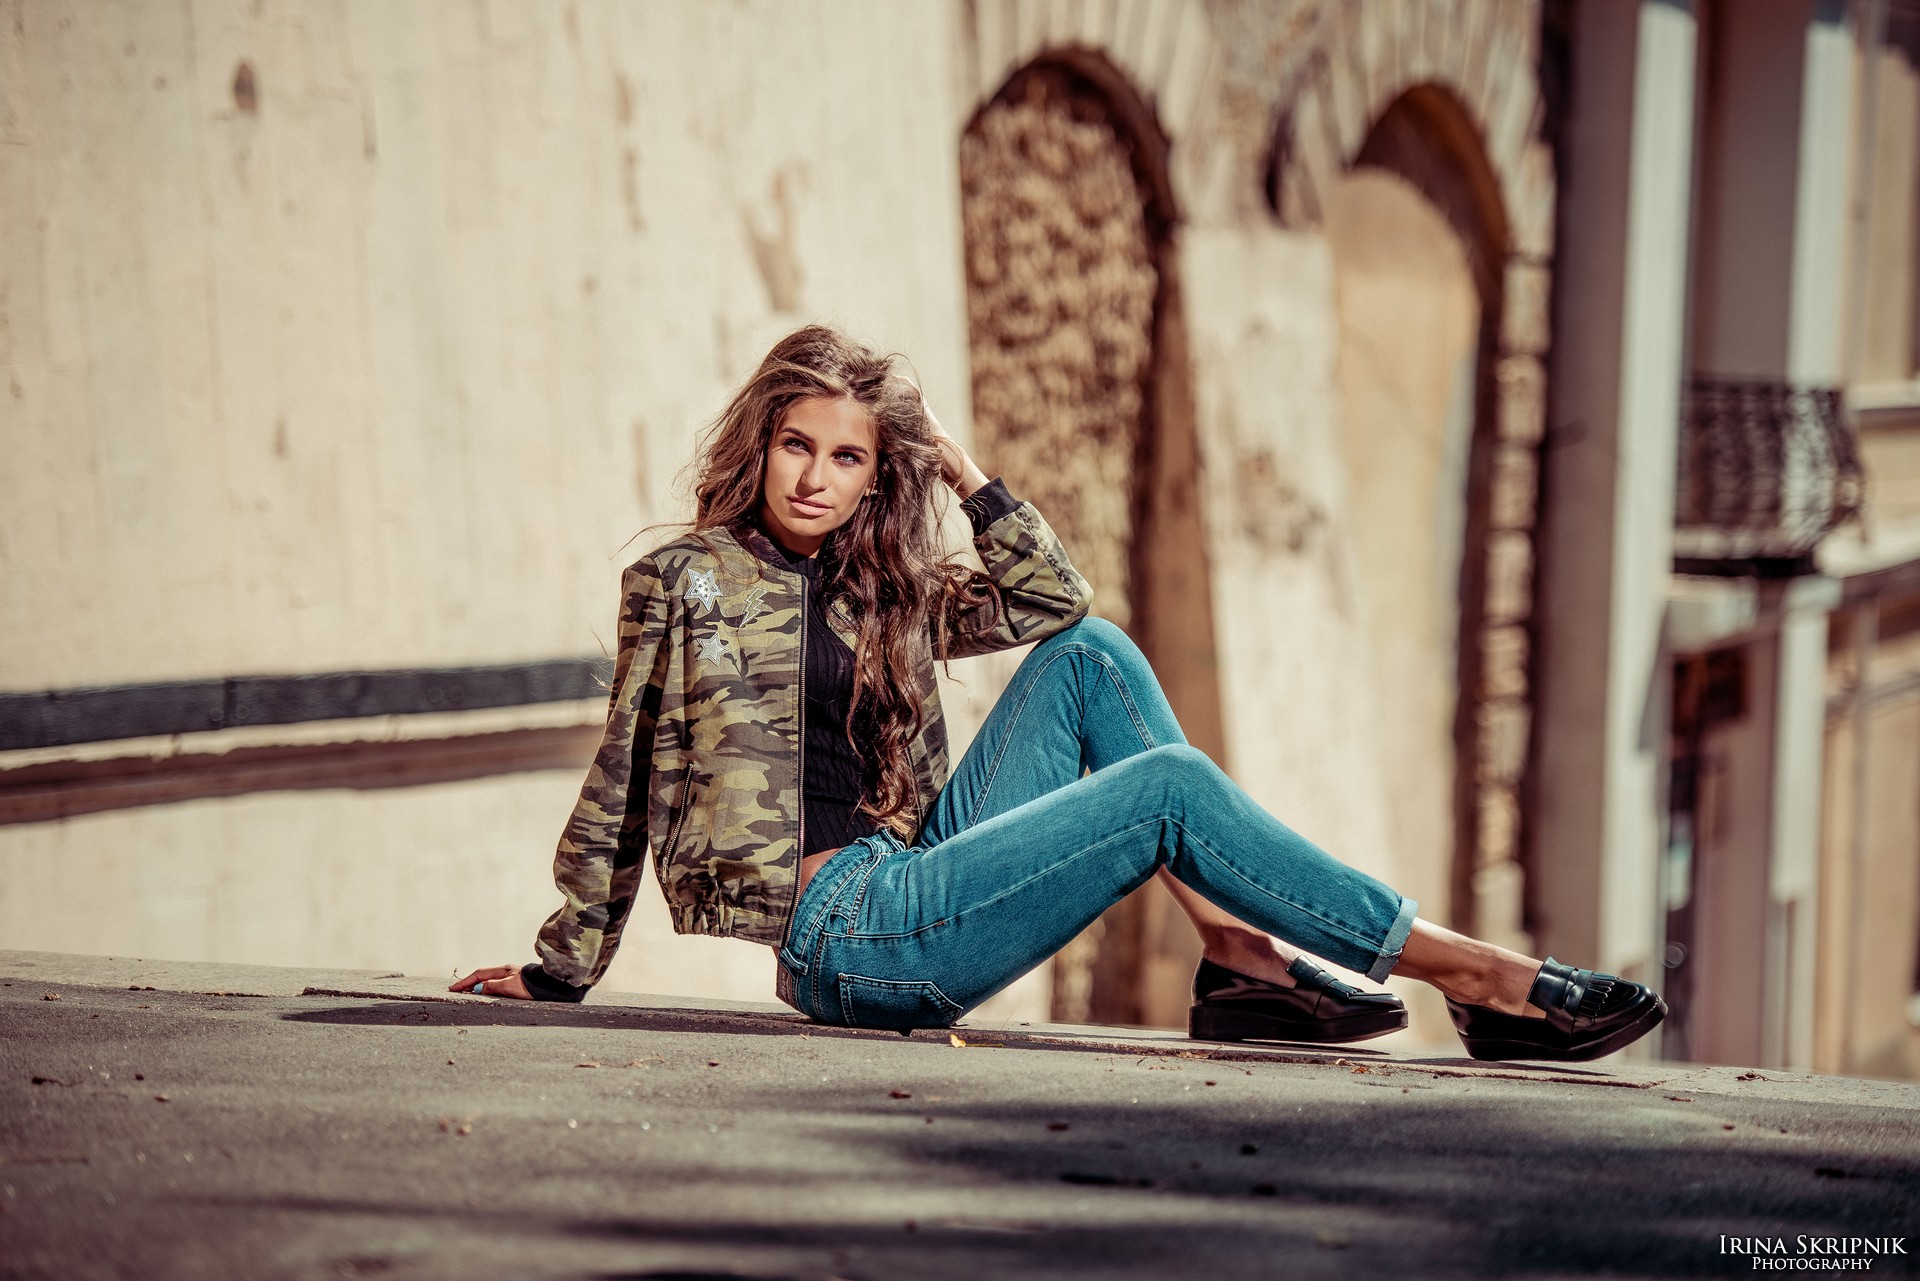 Irina Skripnik Photography 30060